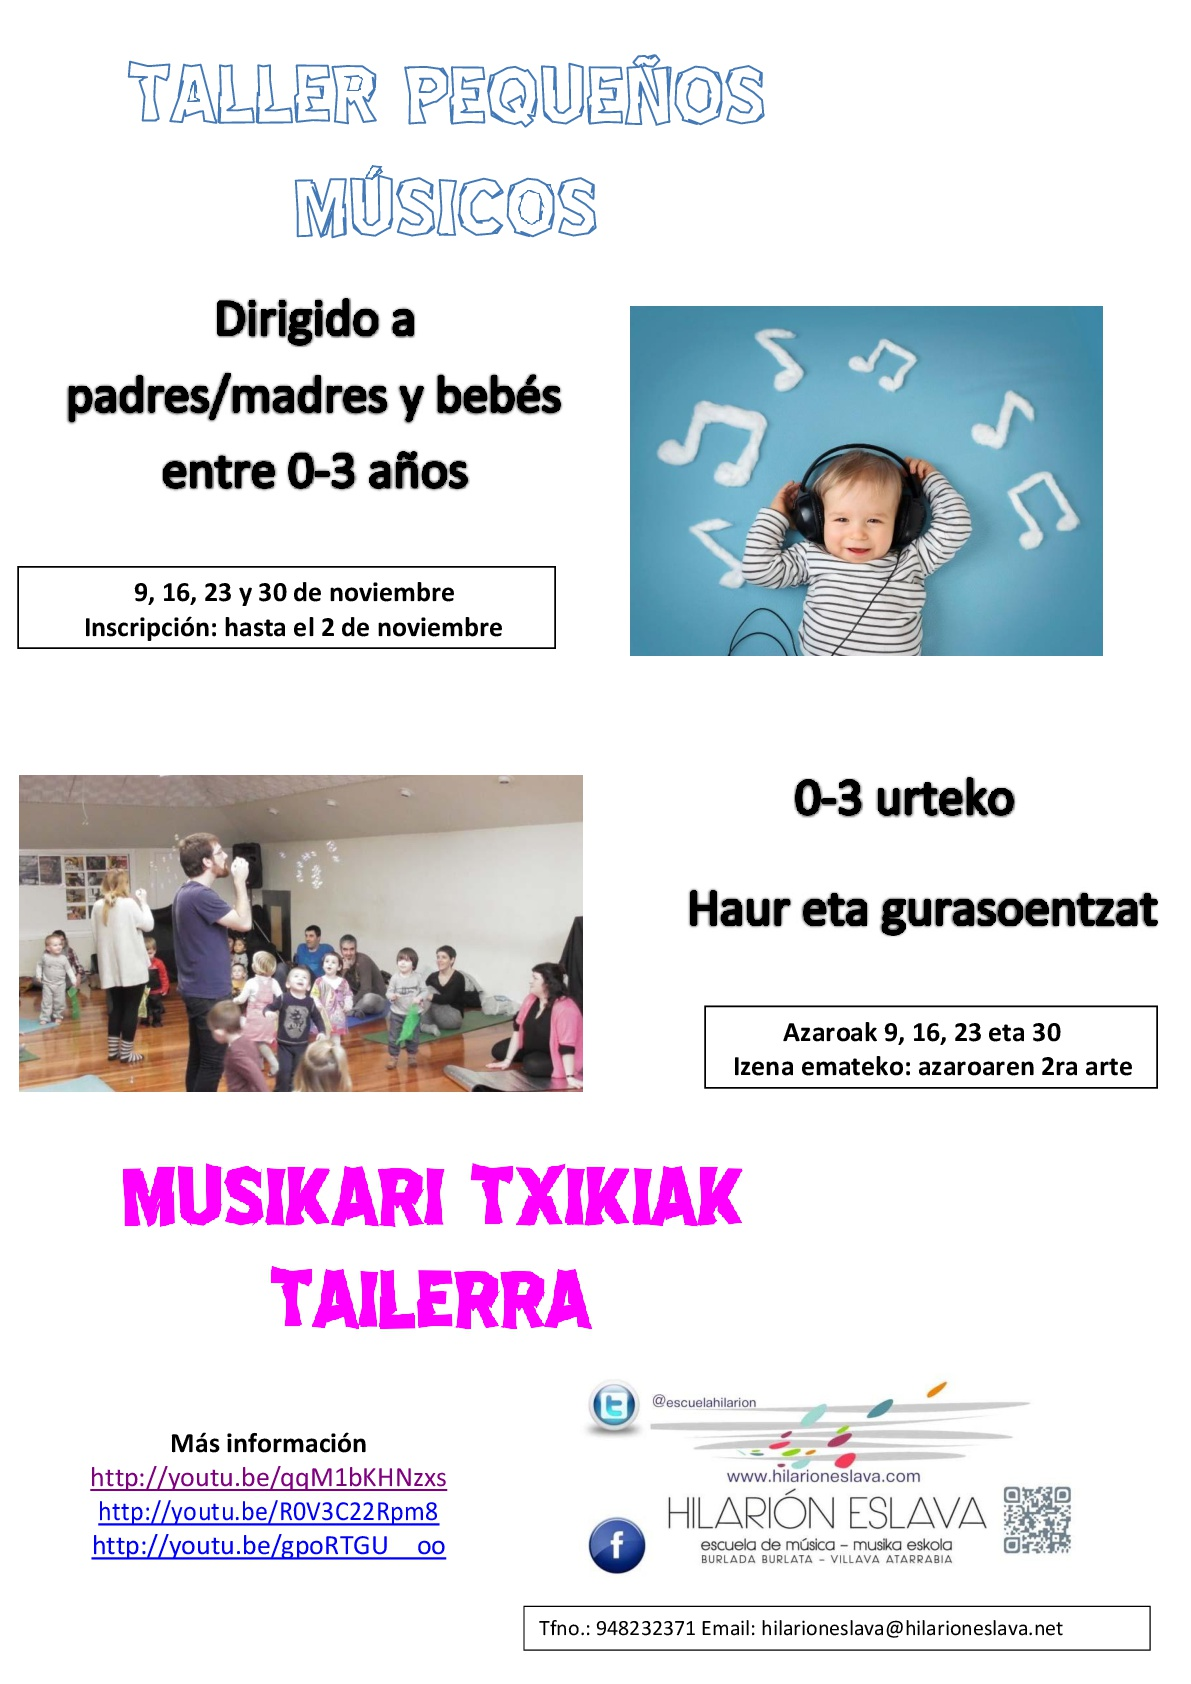 Taller pequeños musicos cartel publi-001